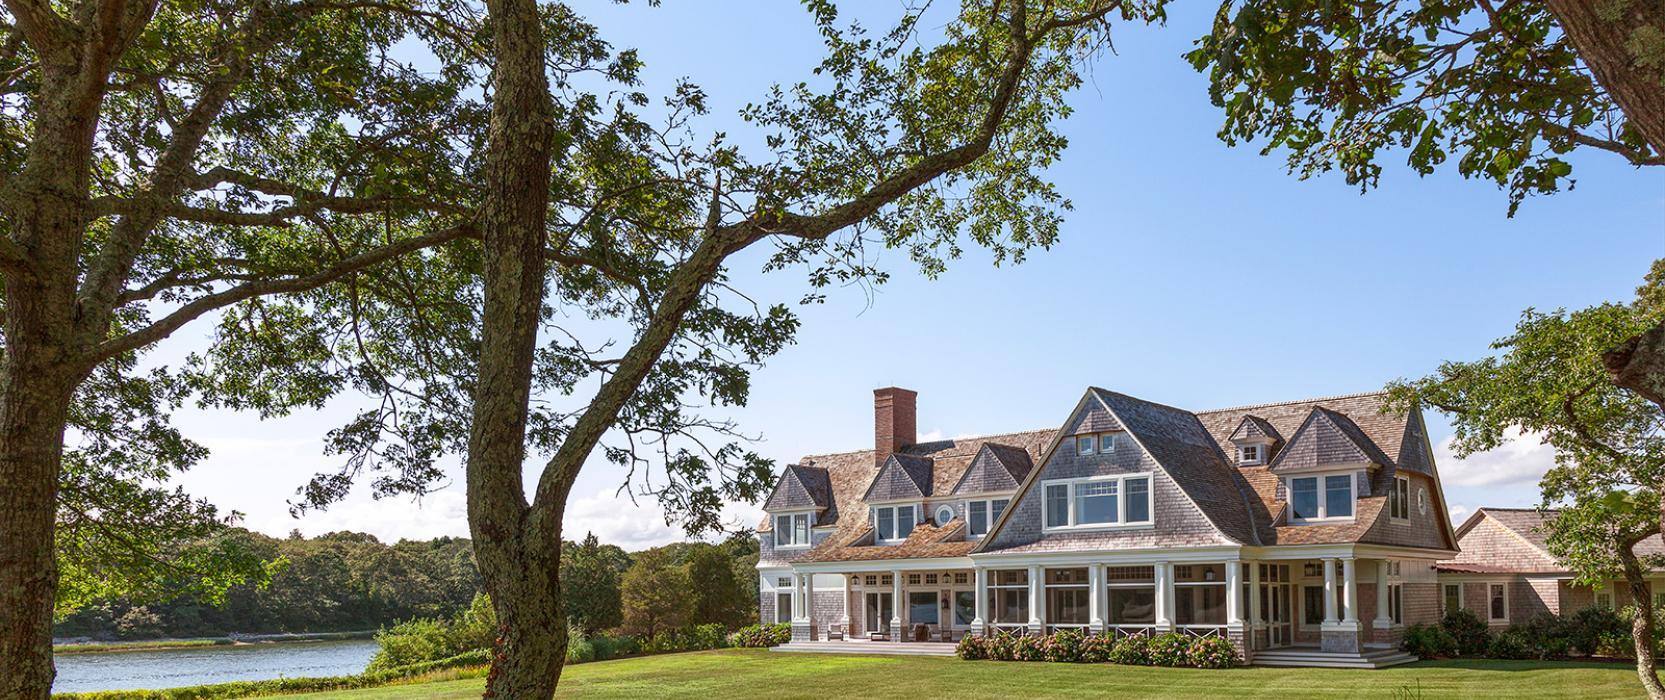 Carefree coastal home